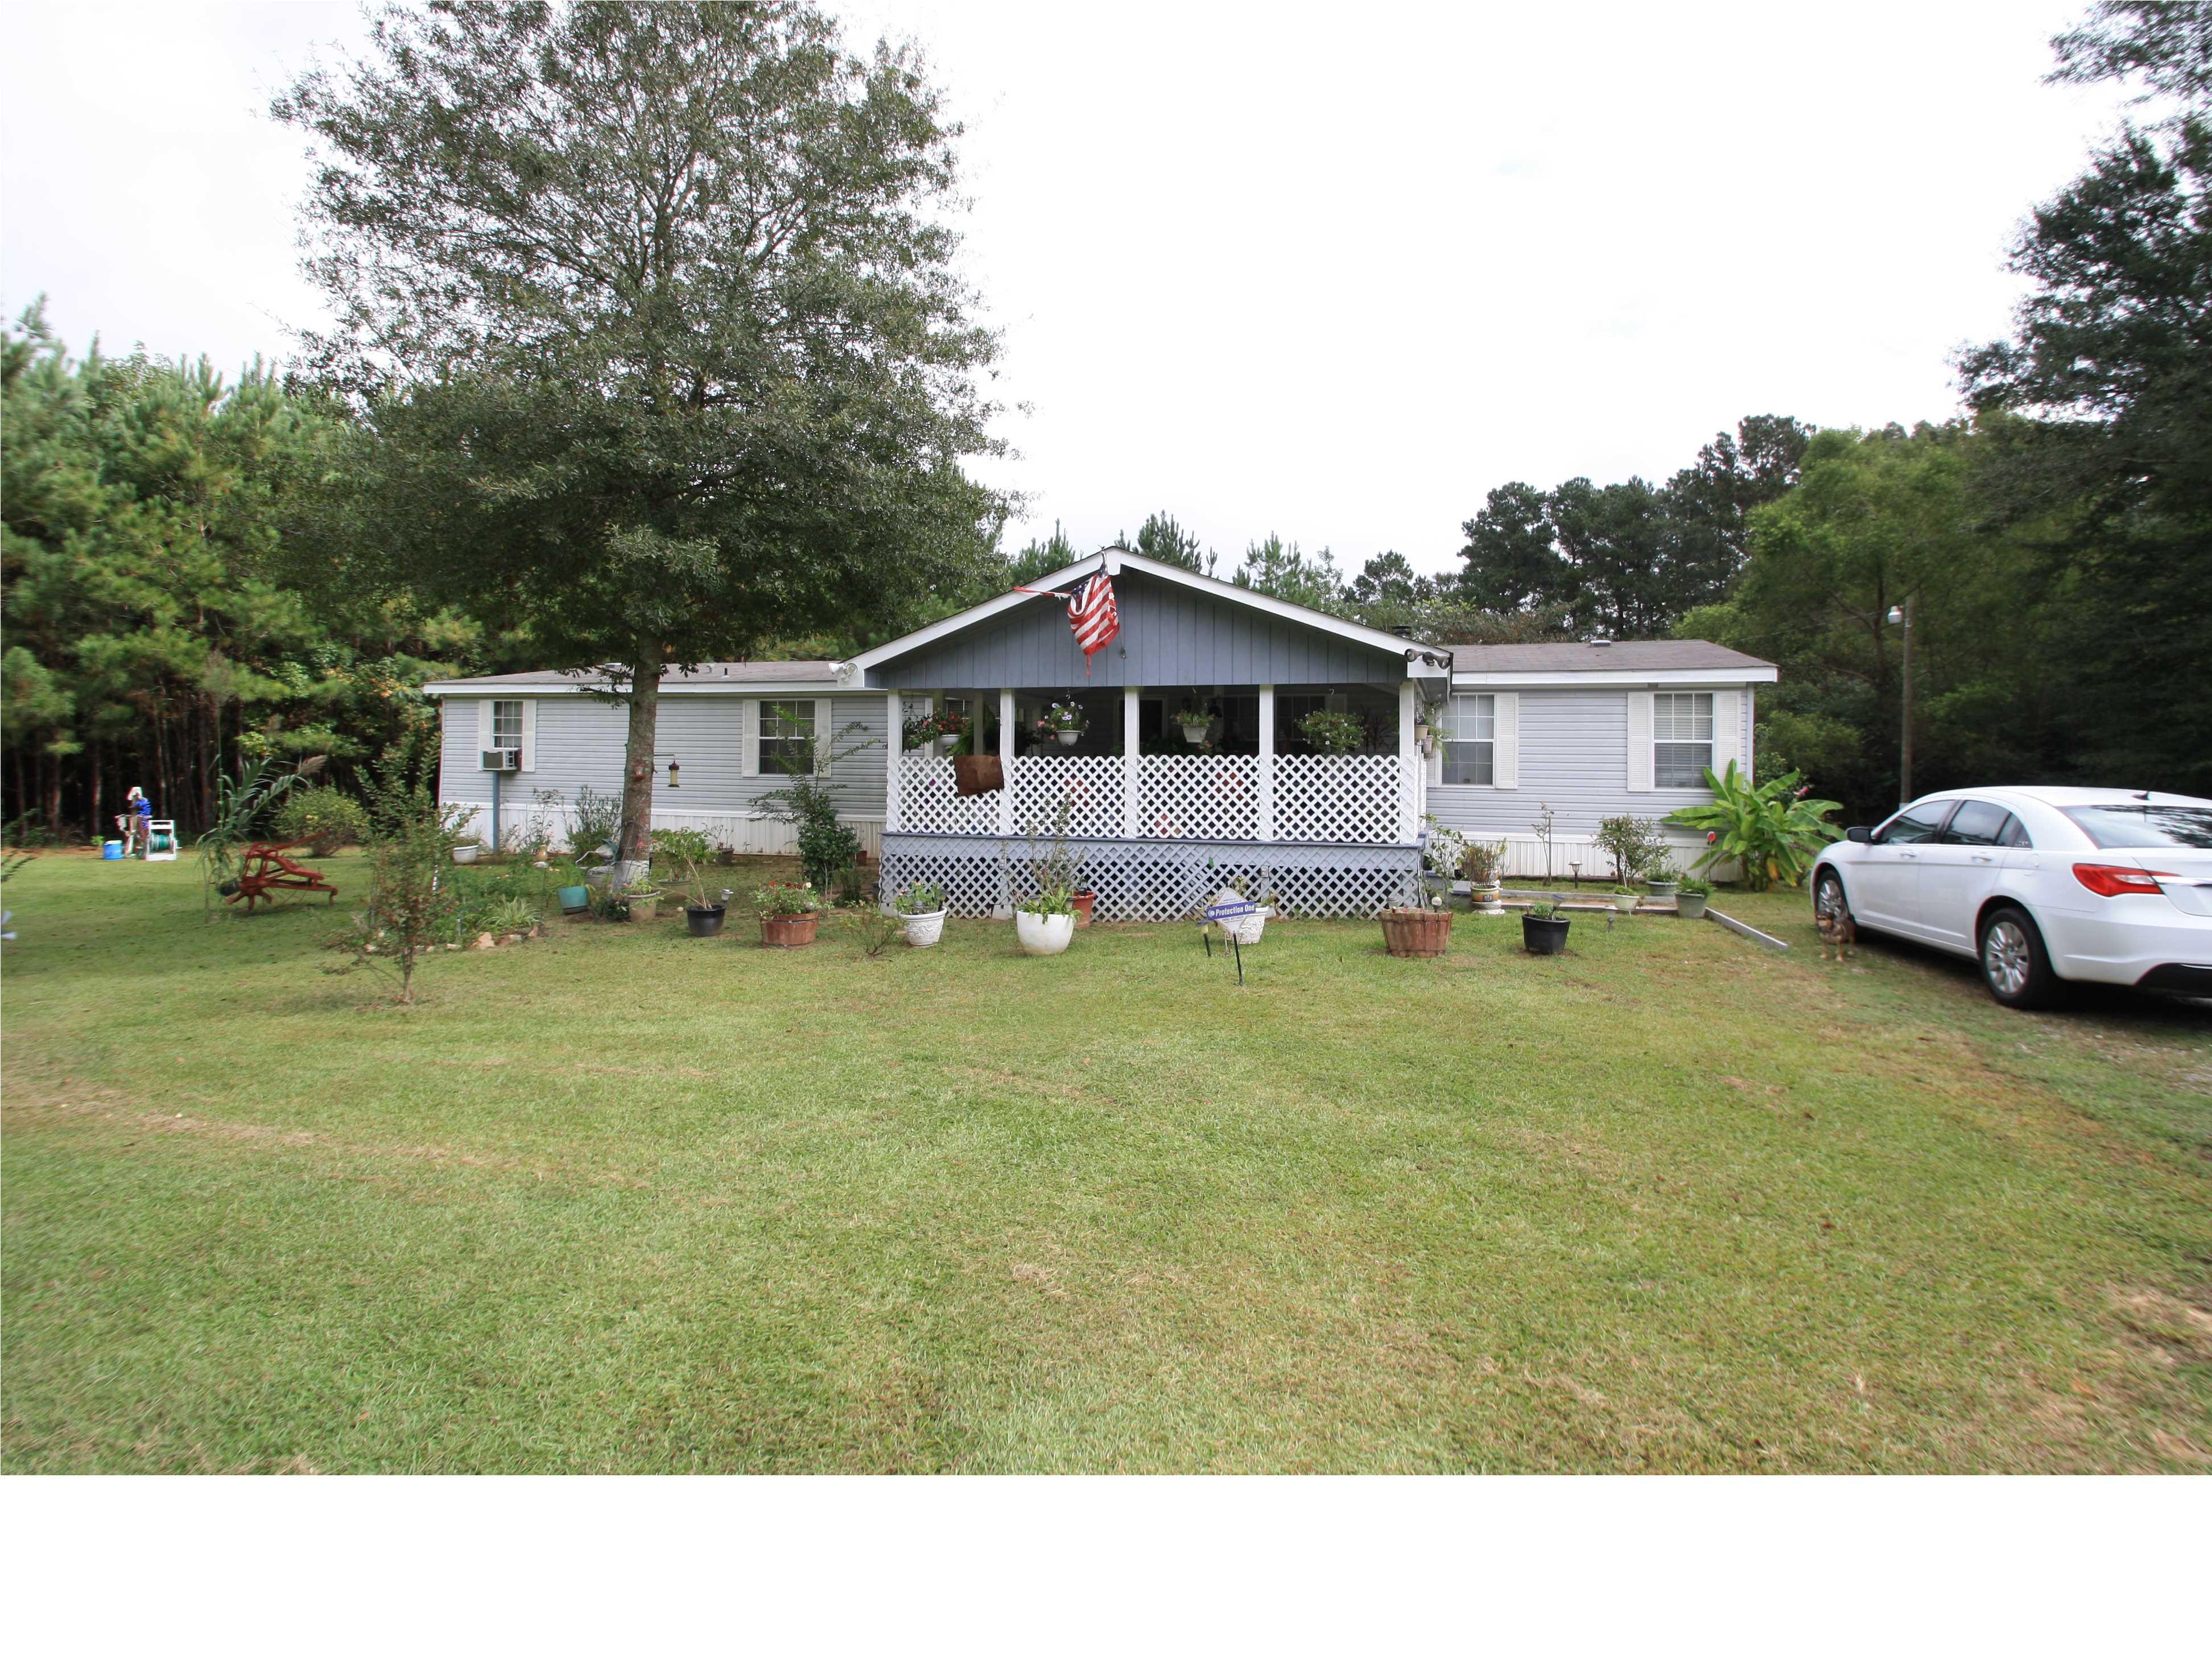 Real Estate for Sale, ListingId: 30201682, Morton,MS39117